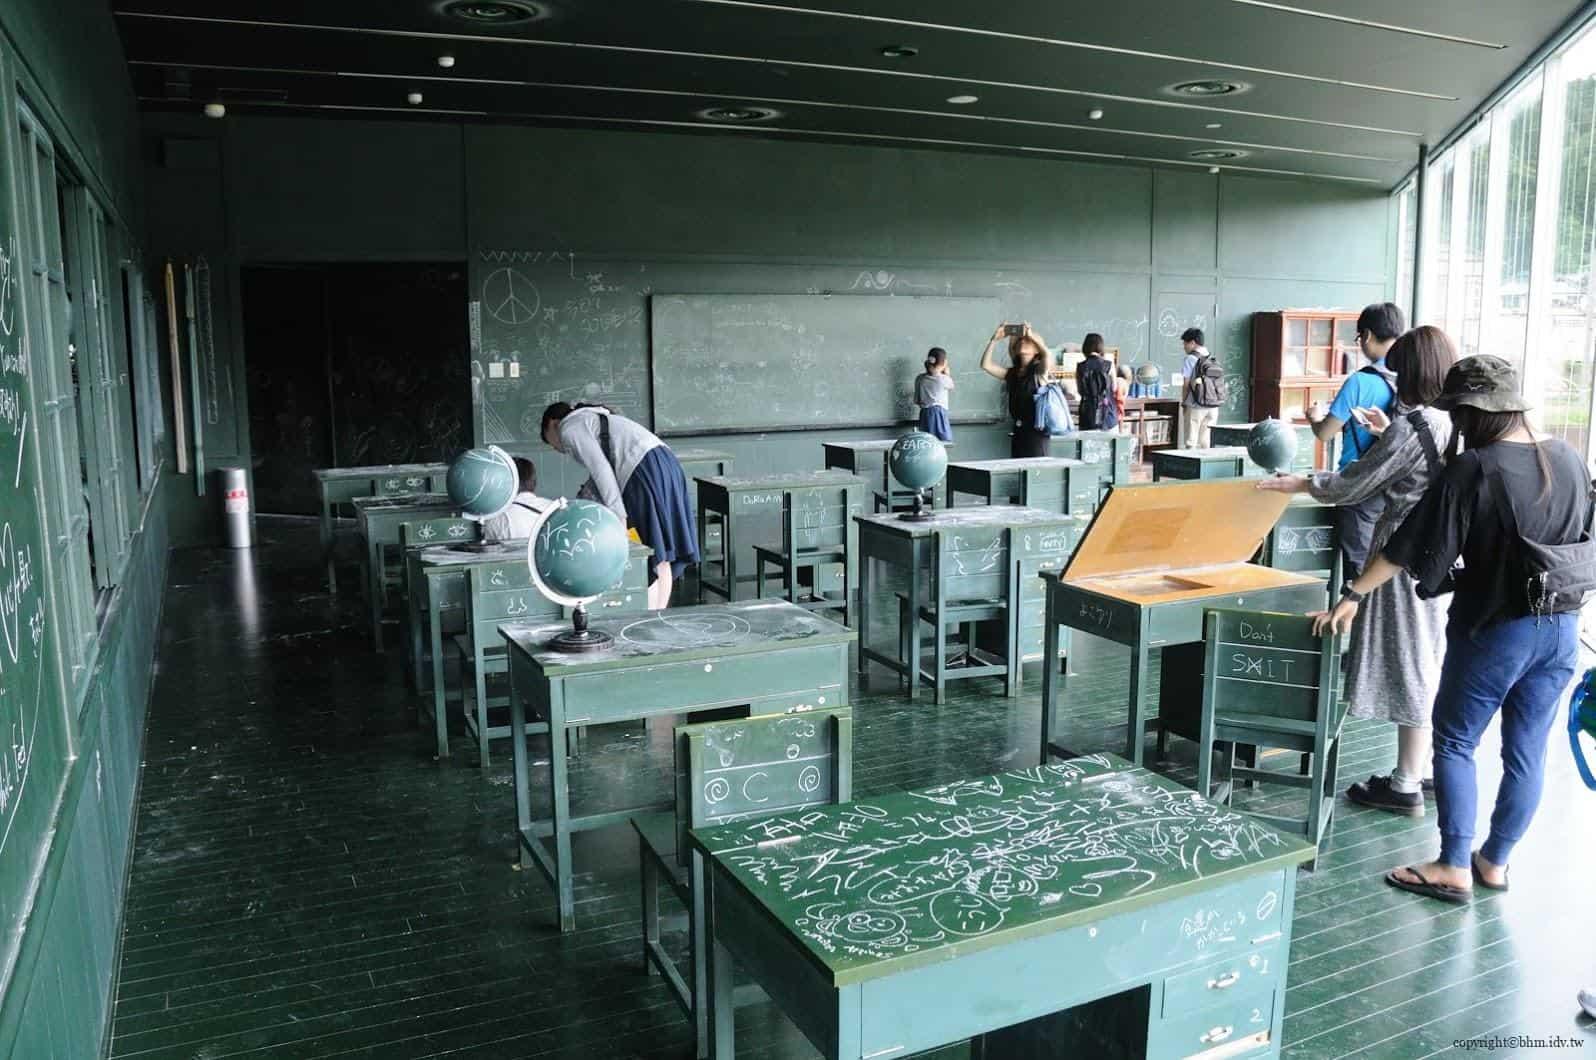 MVRDV,松代雪國農耕文化村[農舞臺],関係-黒板の教室」(教育空間),「如果教室內全都是黑板?那該有多好」於是,作者創作出此作品,無論所見之處牆壁、地板、地圖、地球儀等,所有物品都可以使用粉筆寫字畫圖 松代雪國農耕文化村[農舞臺] 松代雪國農耕文化村[農舞臺] no butai snow land agrarian culture center matsudai 14